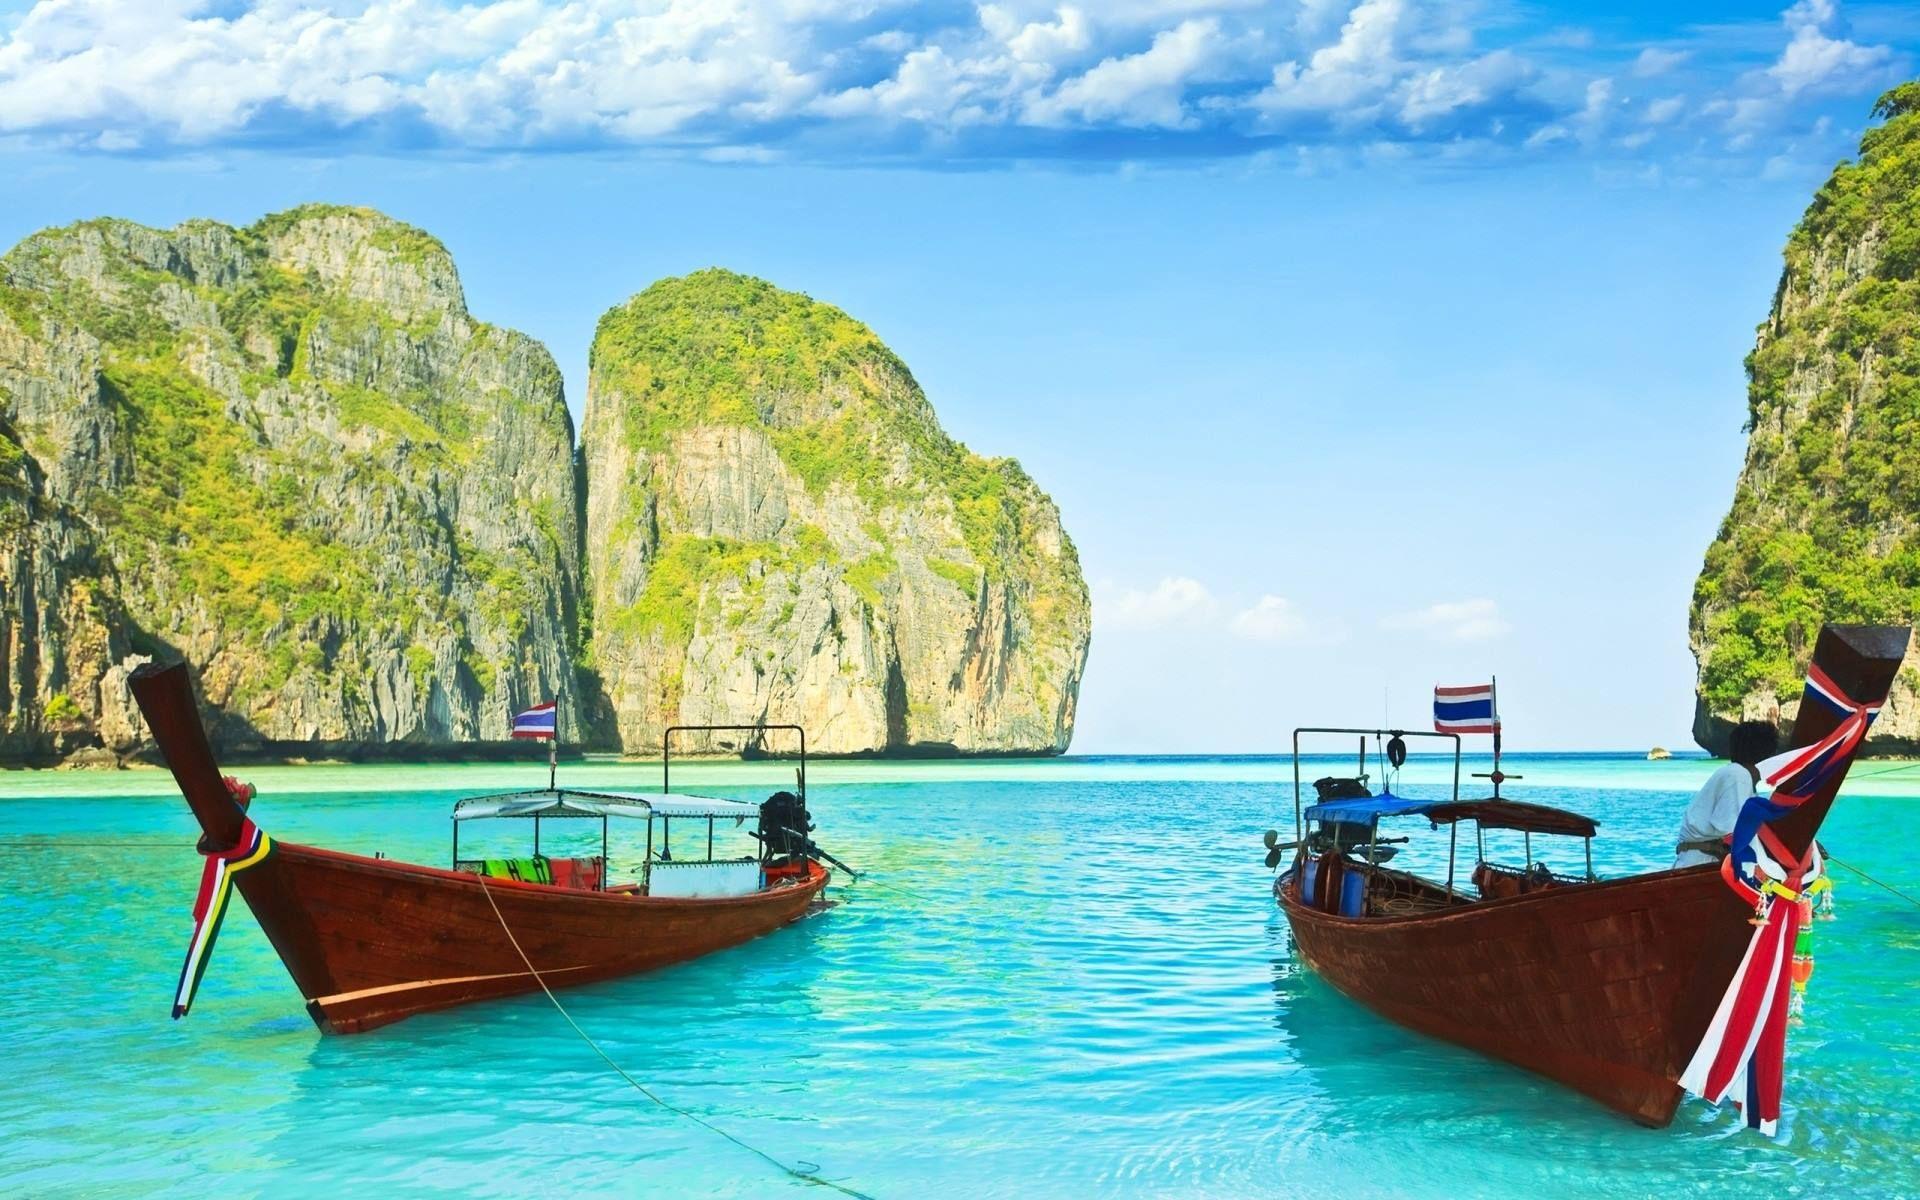 Ko Lanta Phi phi Island Krabi Province,Thailand 9 Places